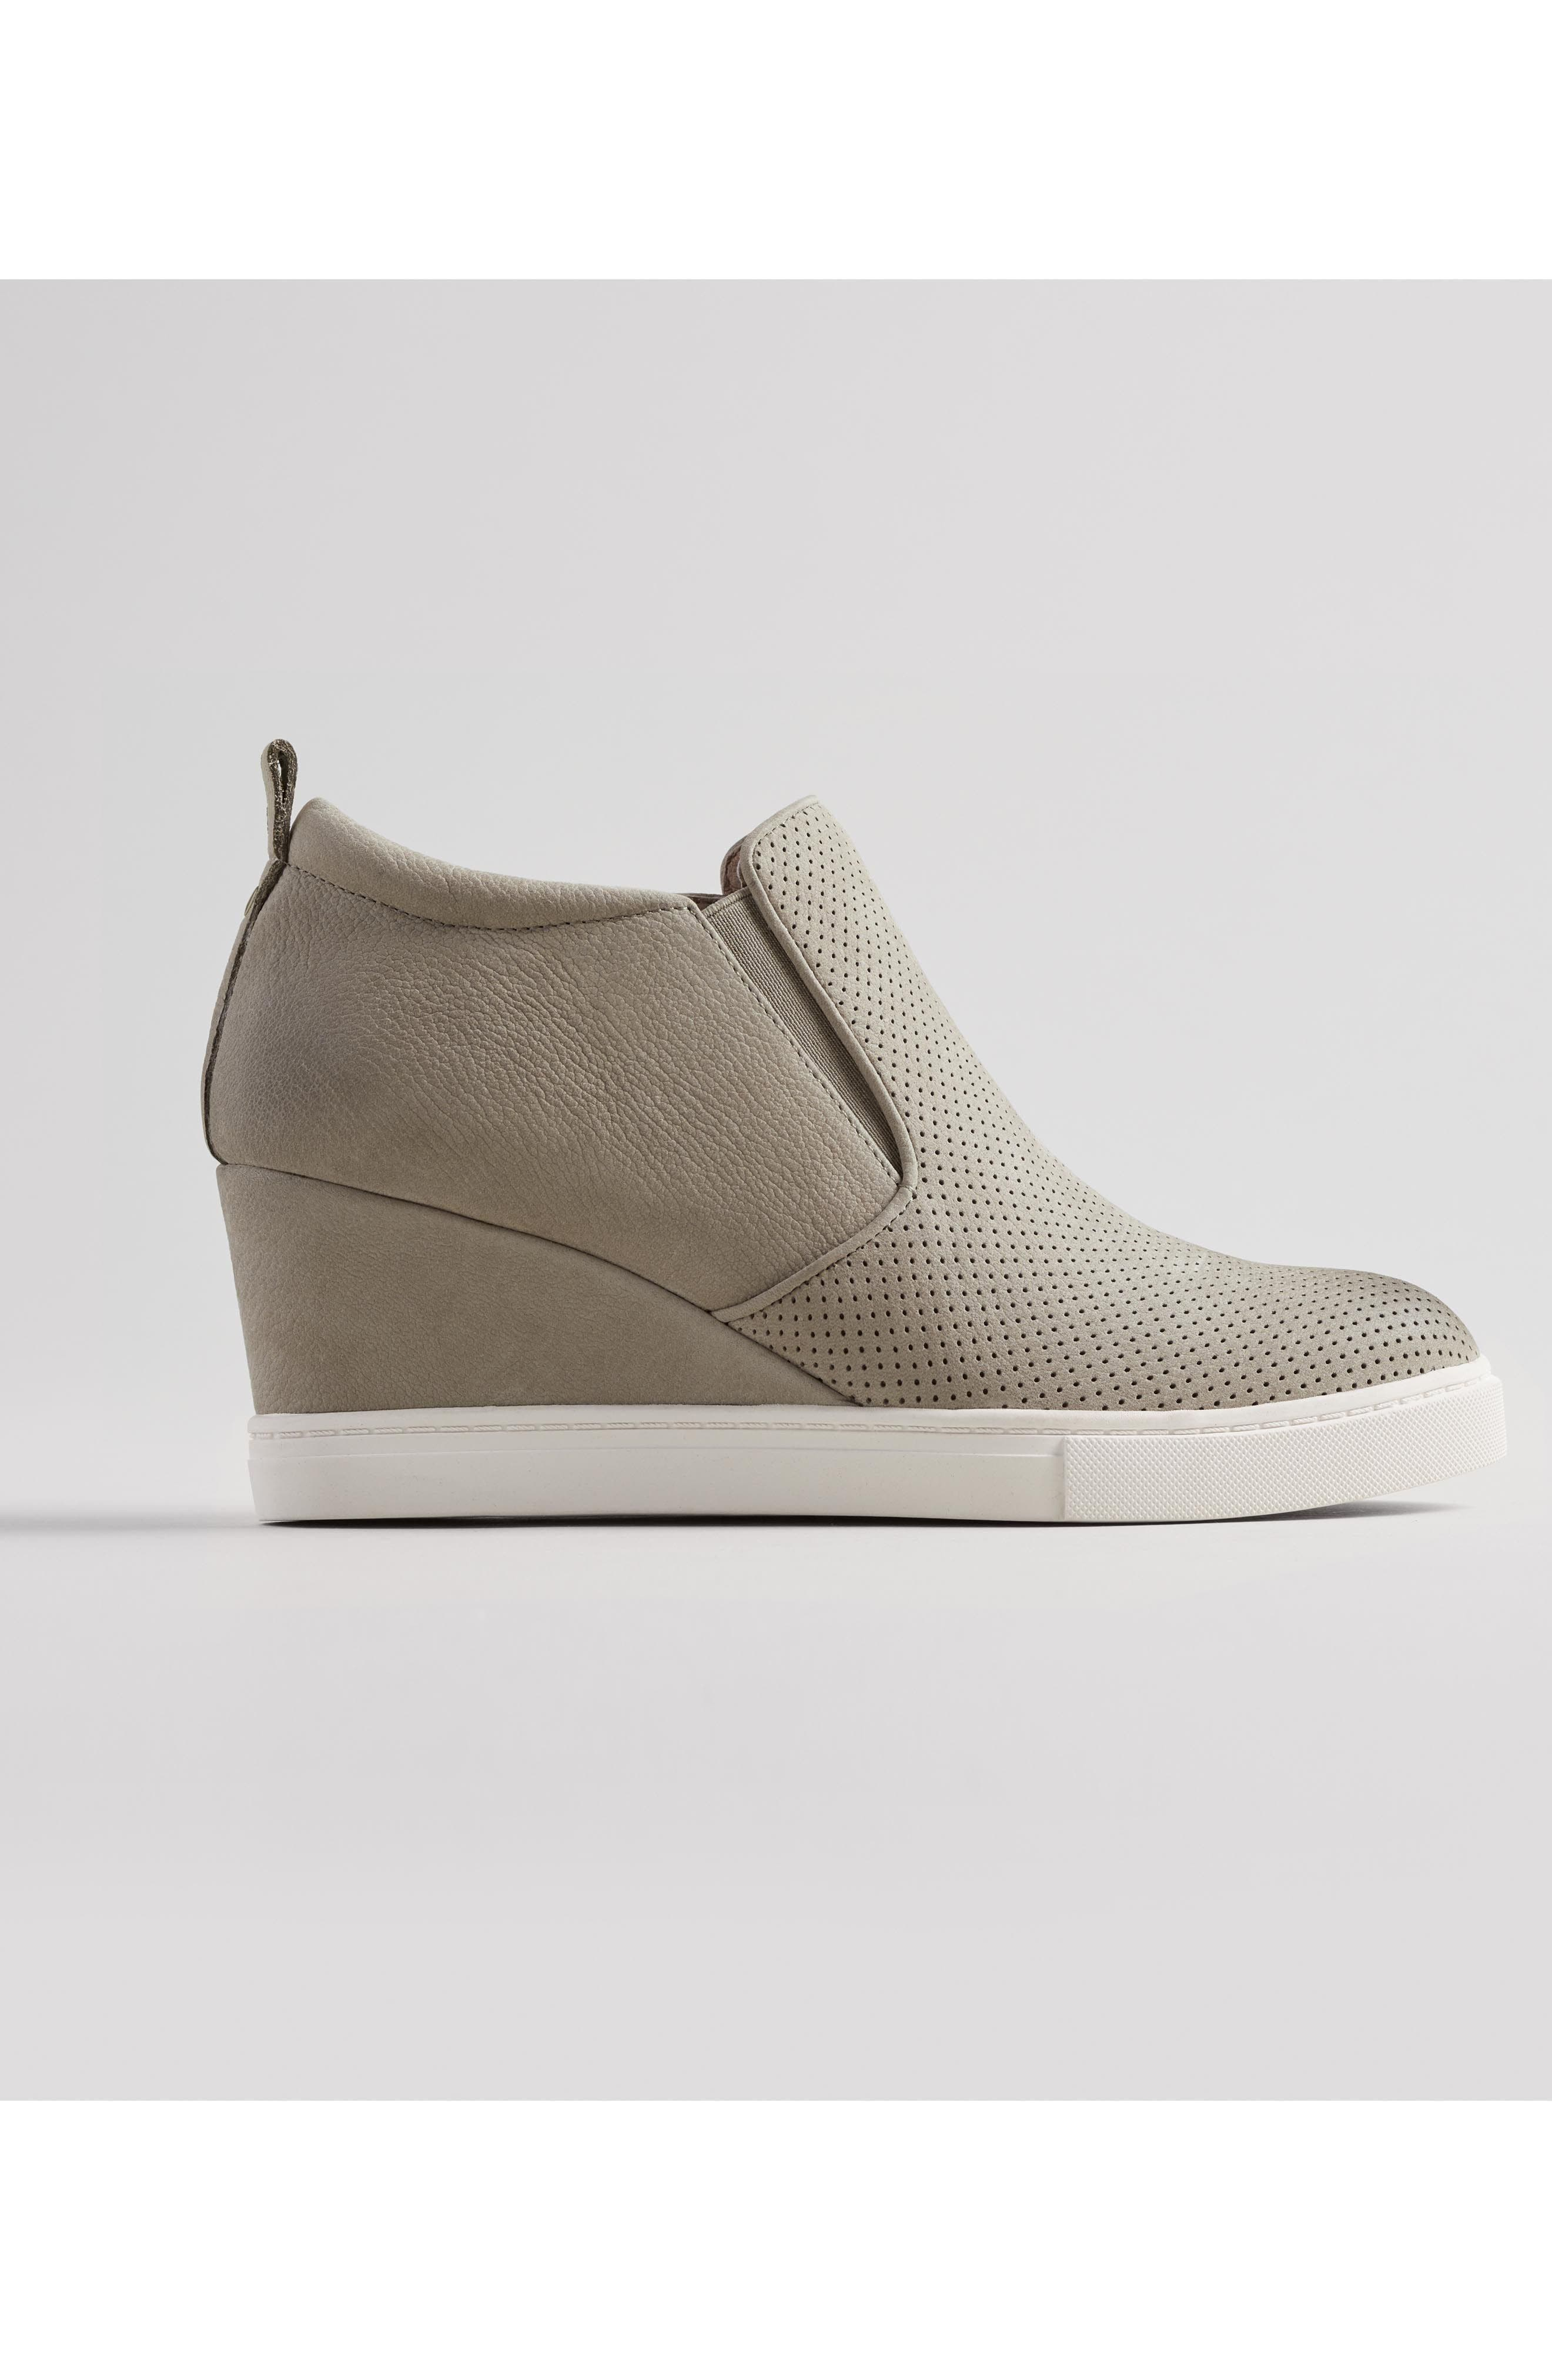 Aiden Wedge Sneaker,                             Alternate thumbnail 7, color,